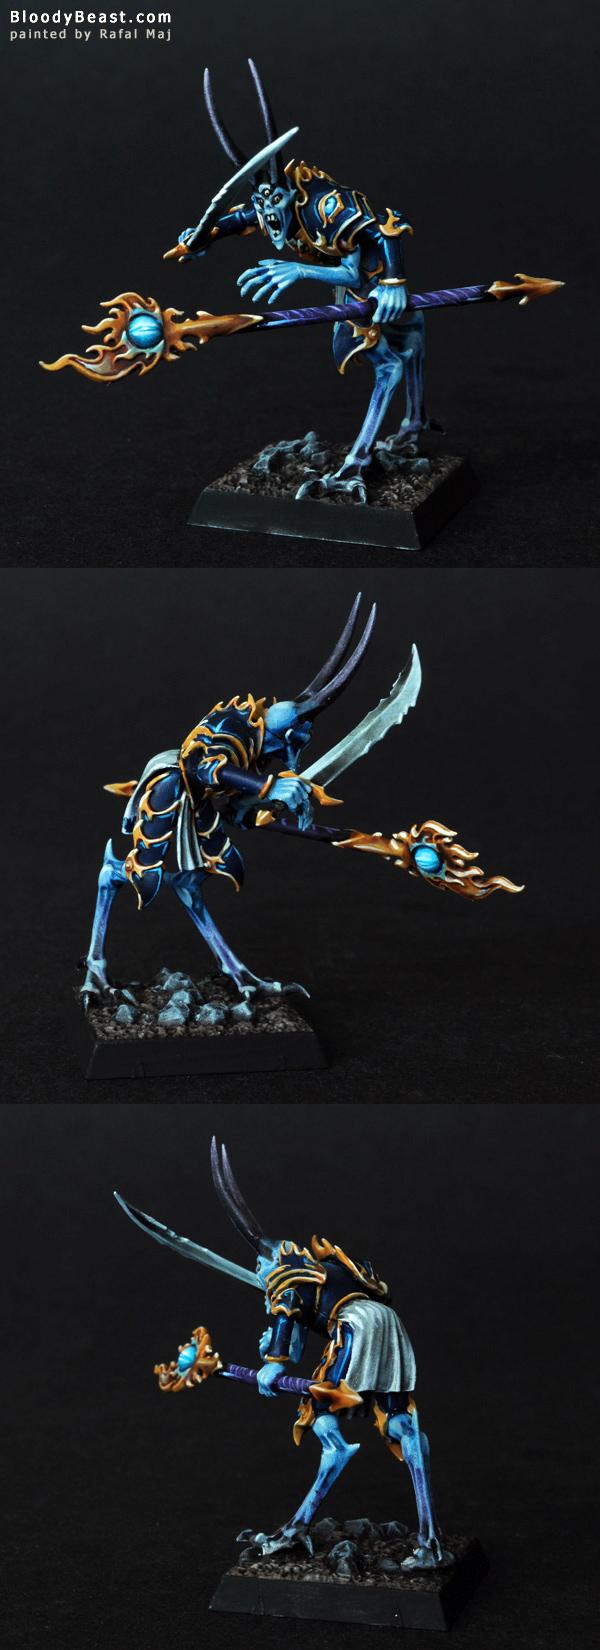 Warriors of Chaos Tzeentch Sorcerer Lord painted by Rafal Maj (BloodyBeast.com)